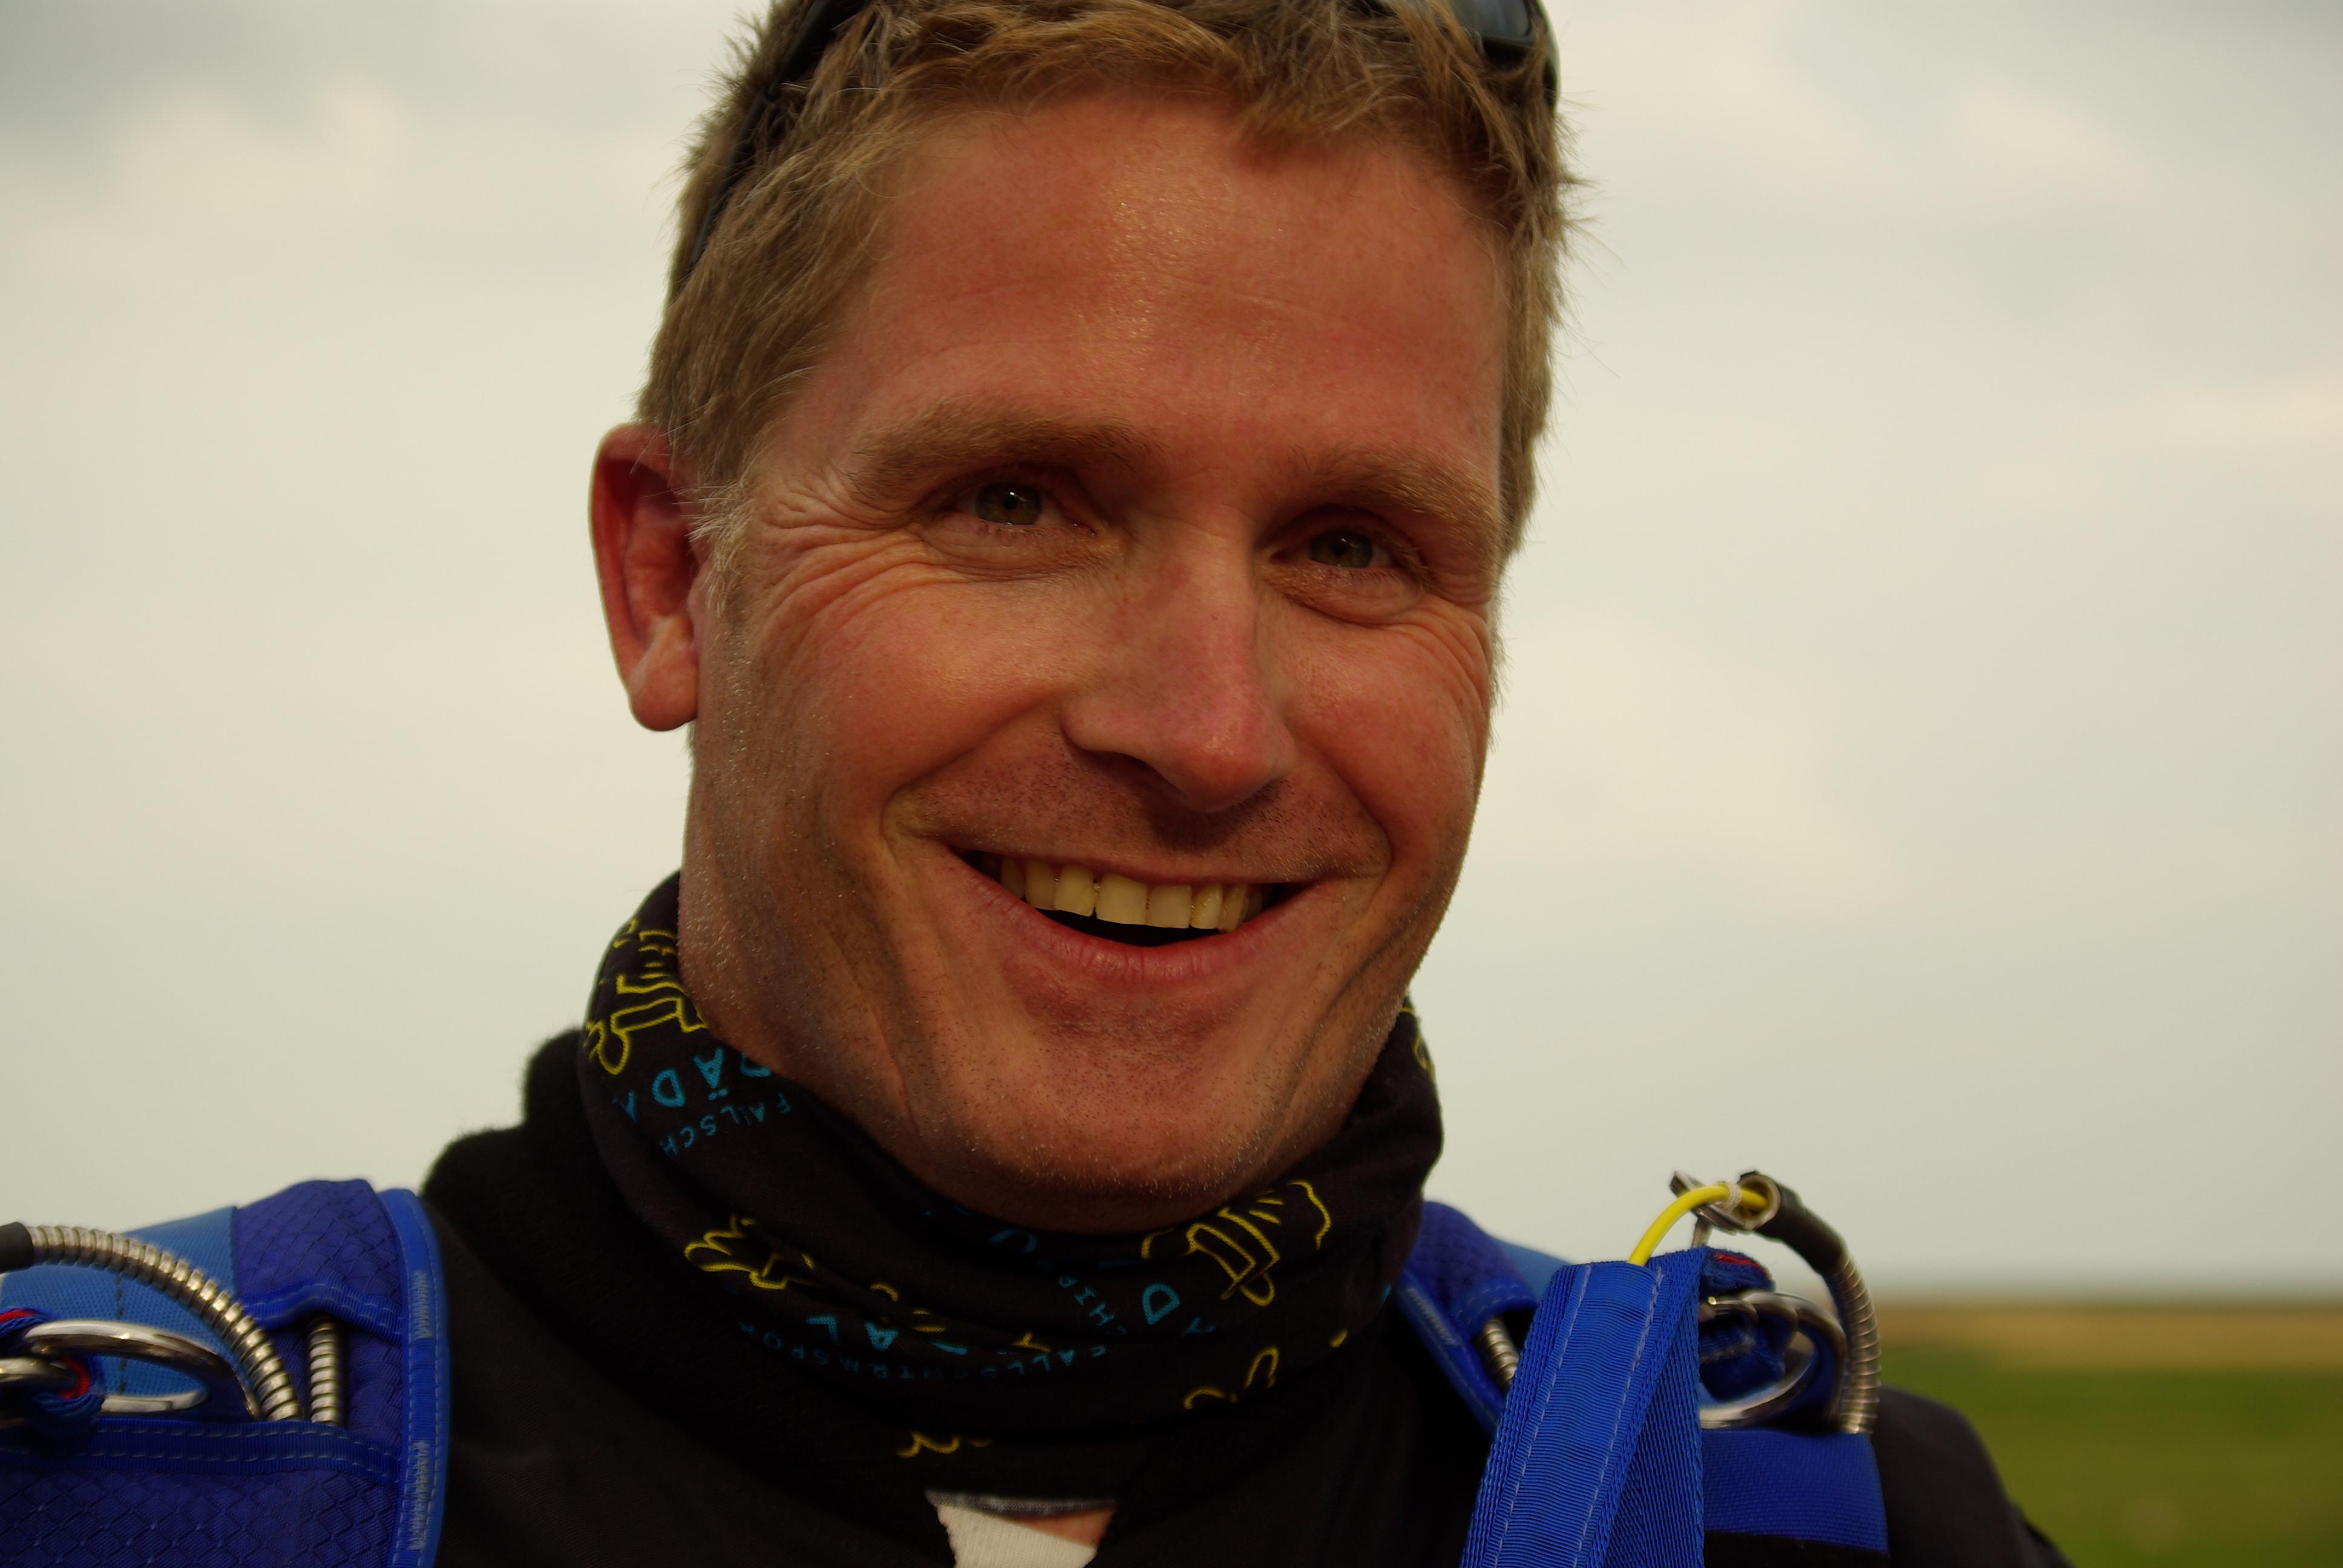 Carsten Lembeck